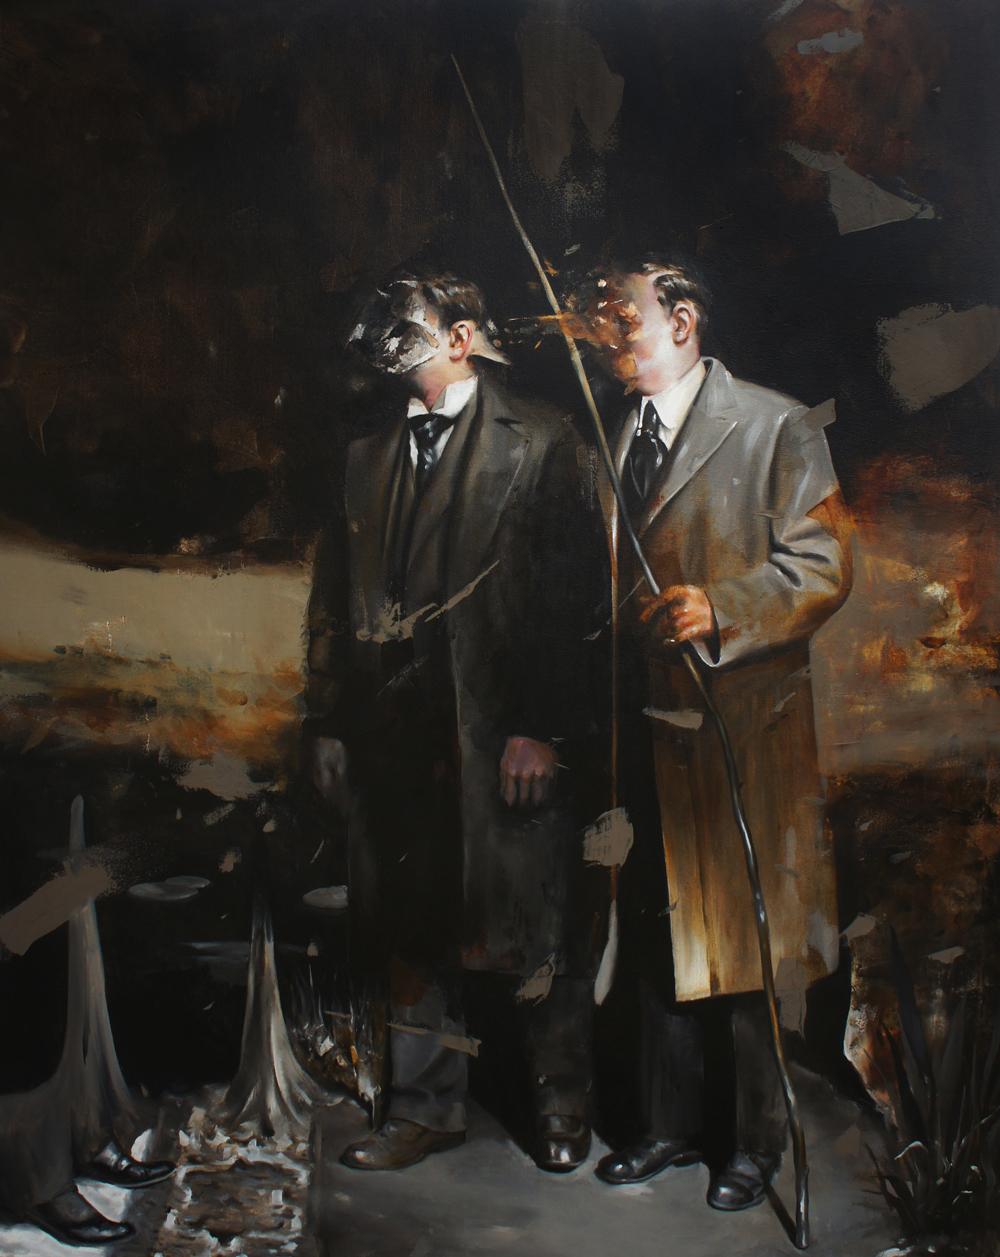 Radu Belcin, Travellers, 2013, oil on canvas, 165x135cm